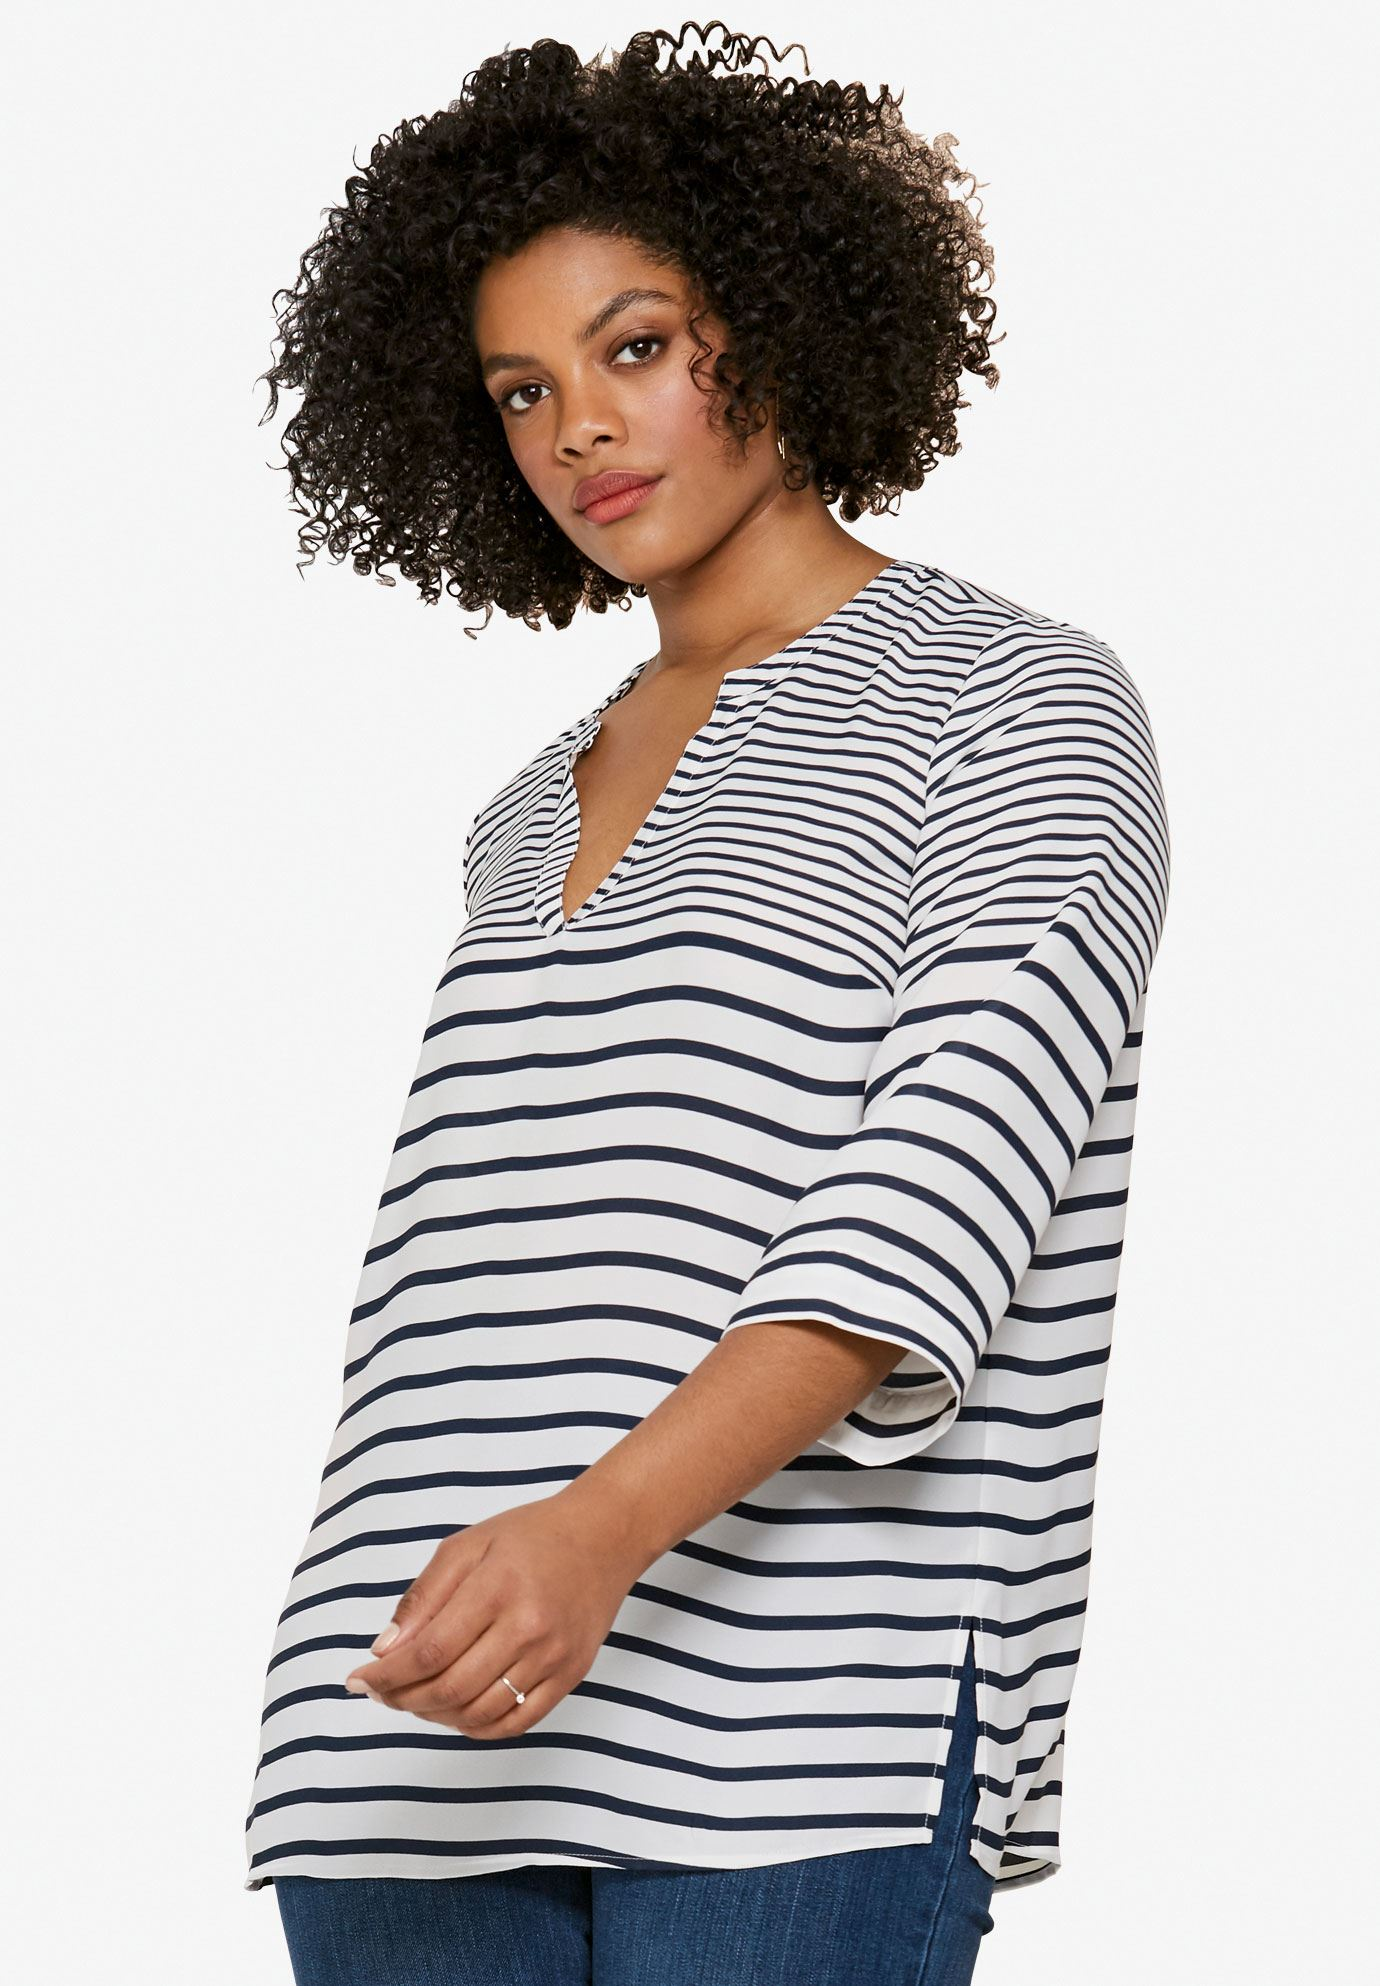 Oversized V Neck Sheer Blouse By Ellos Plus Size Tops Ellos